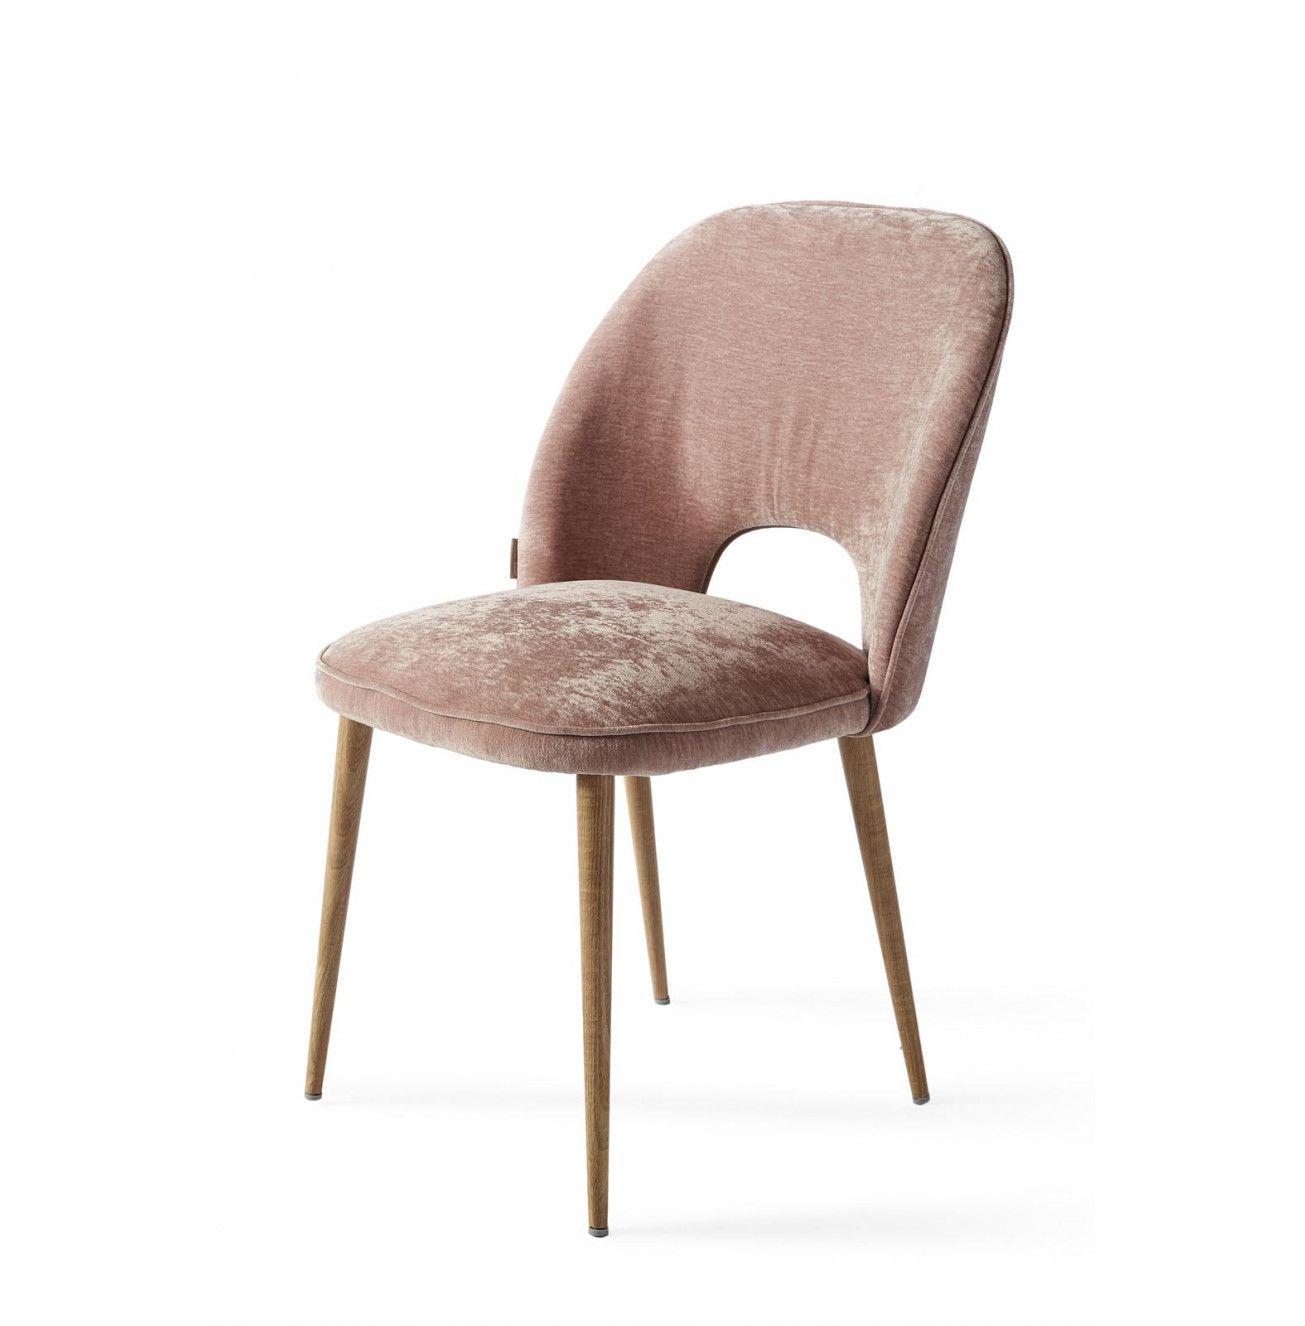 Design Tafel Stoelen.Victoria Dining Chair Velvet Pink Eetkamerstoelen Stoelen